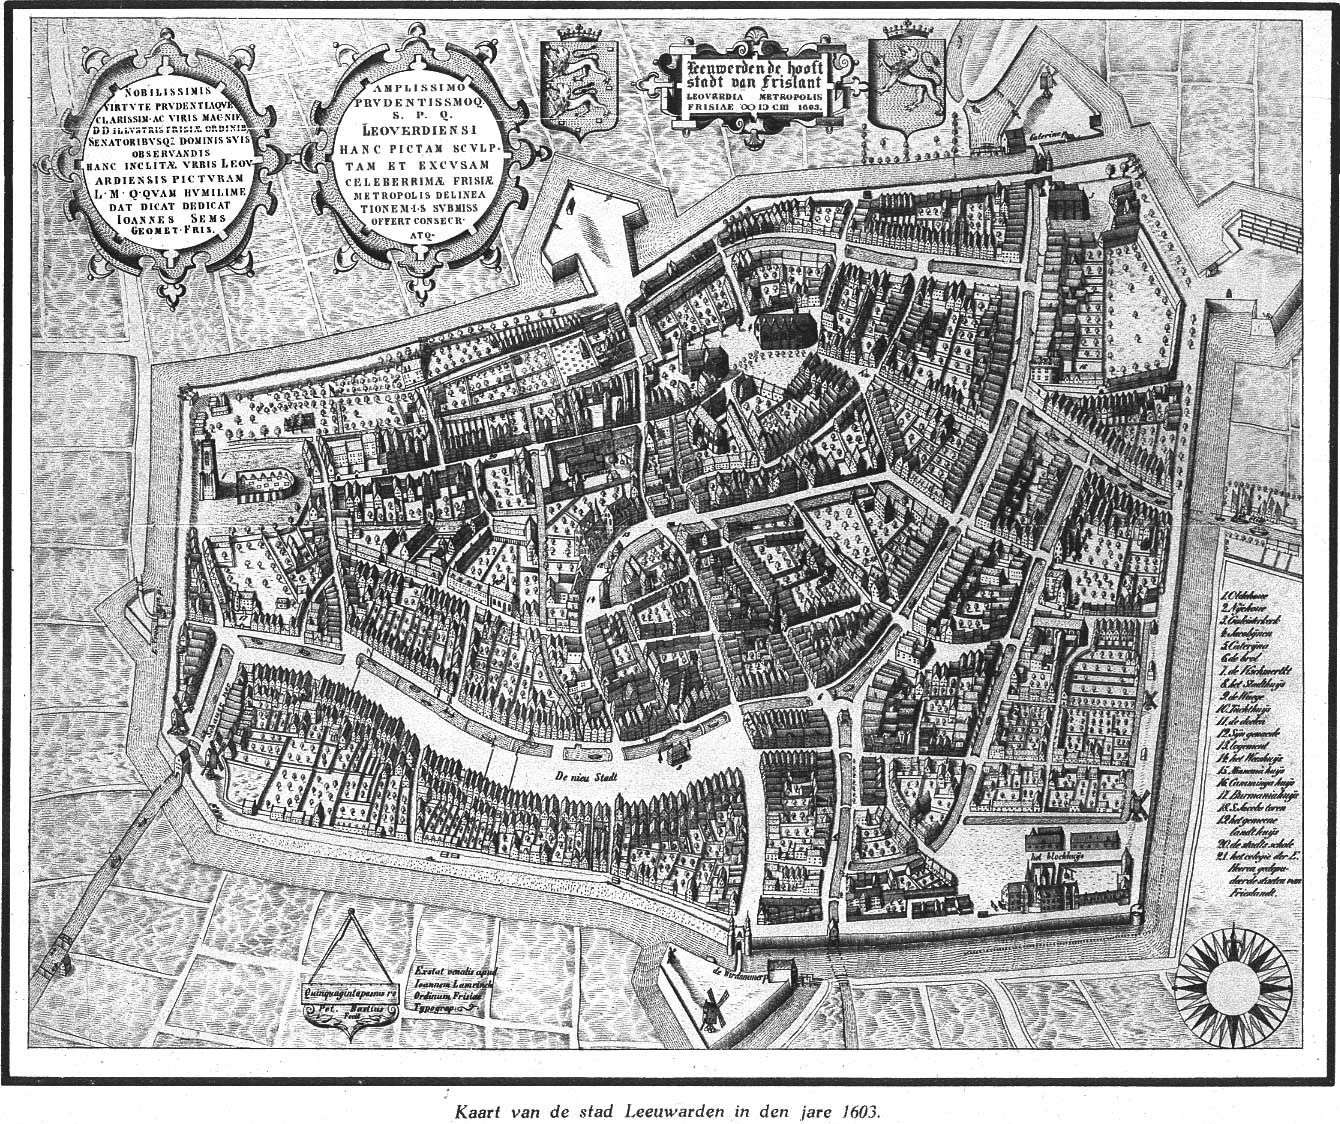 Map of Leeuwarden 1603 Maps Pinterest History